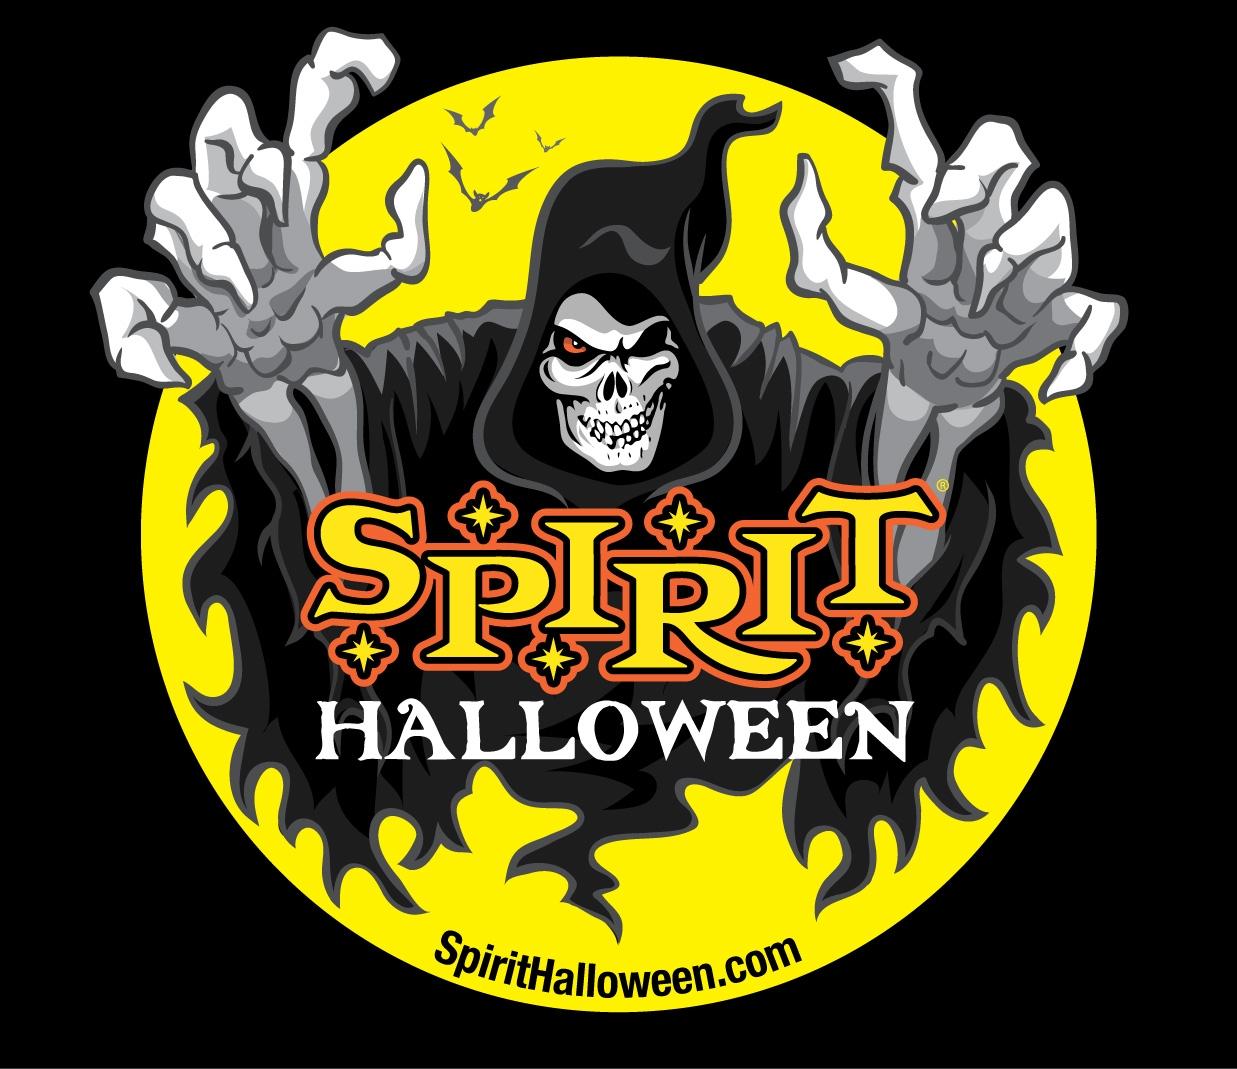 hot 3 new spirit halloween coupons available - Halloween Spirit 2016